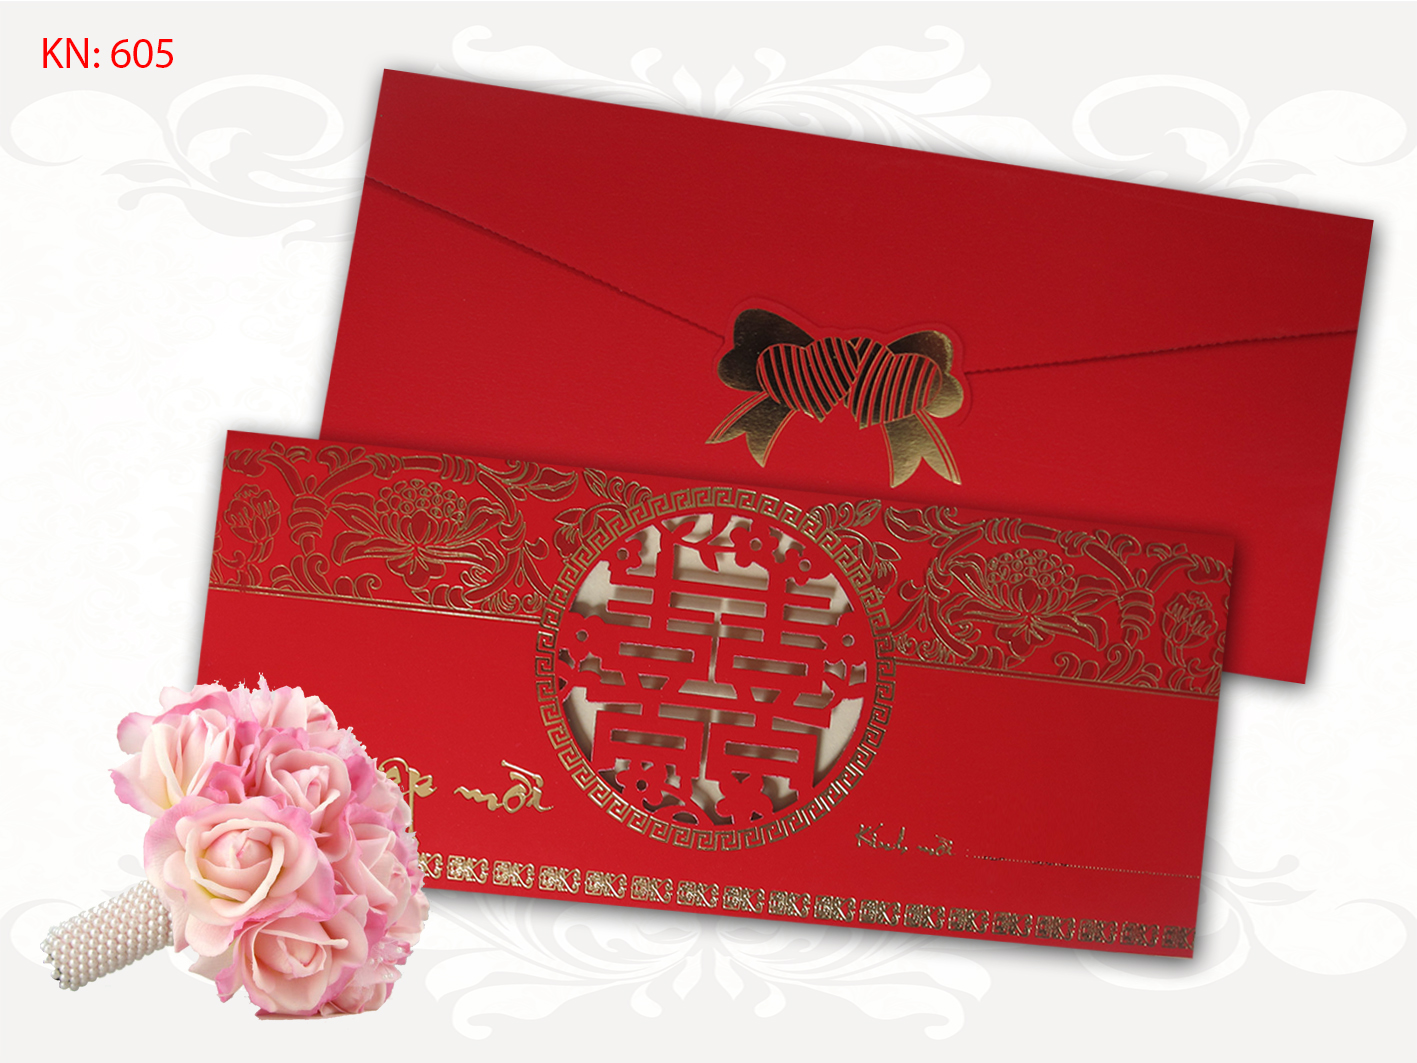 Mẫu thiệp cưới truyền thốngMẫu thiệp cưới truyền thống KN 605